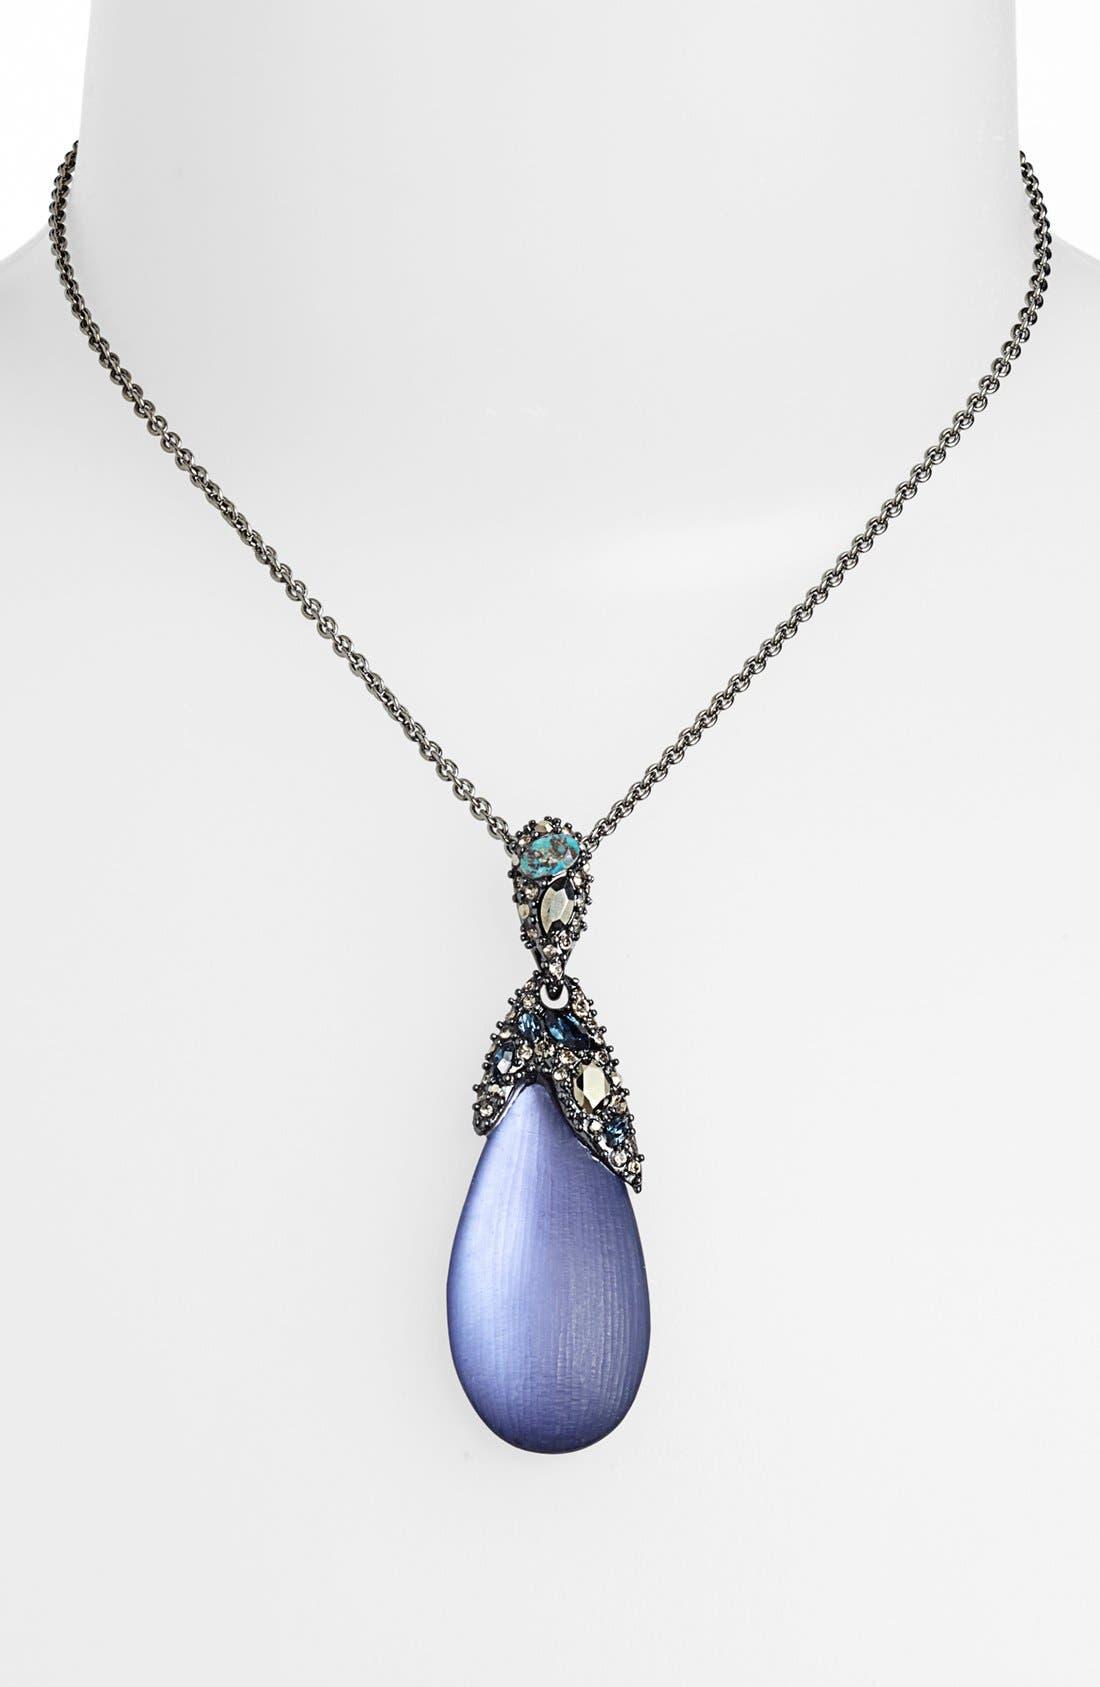 Alternate Image 1 Selected - Alexis Bittar 'Lucite® - Neo Bohemian' Teardrop Pendant Necklace